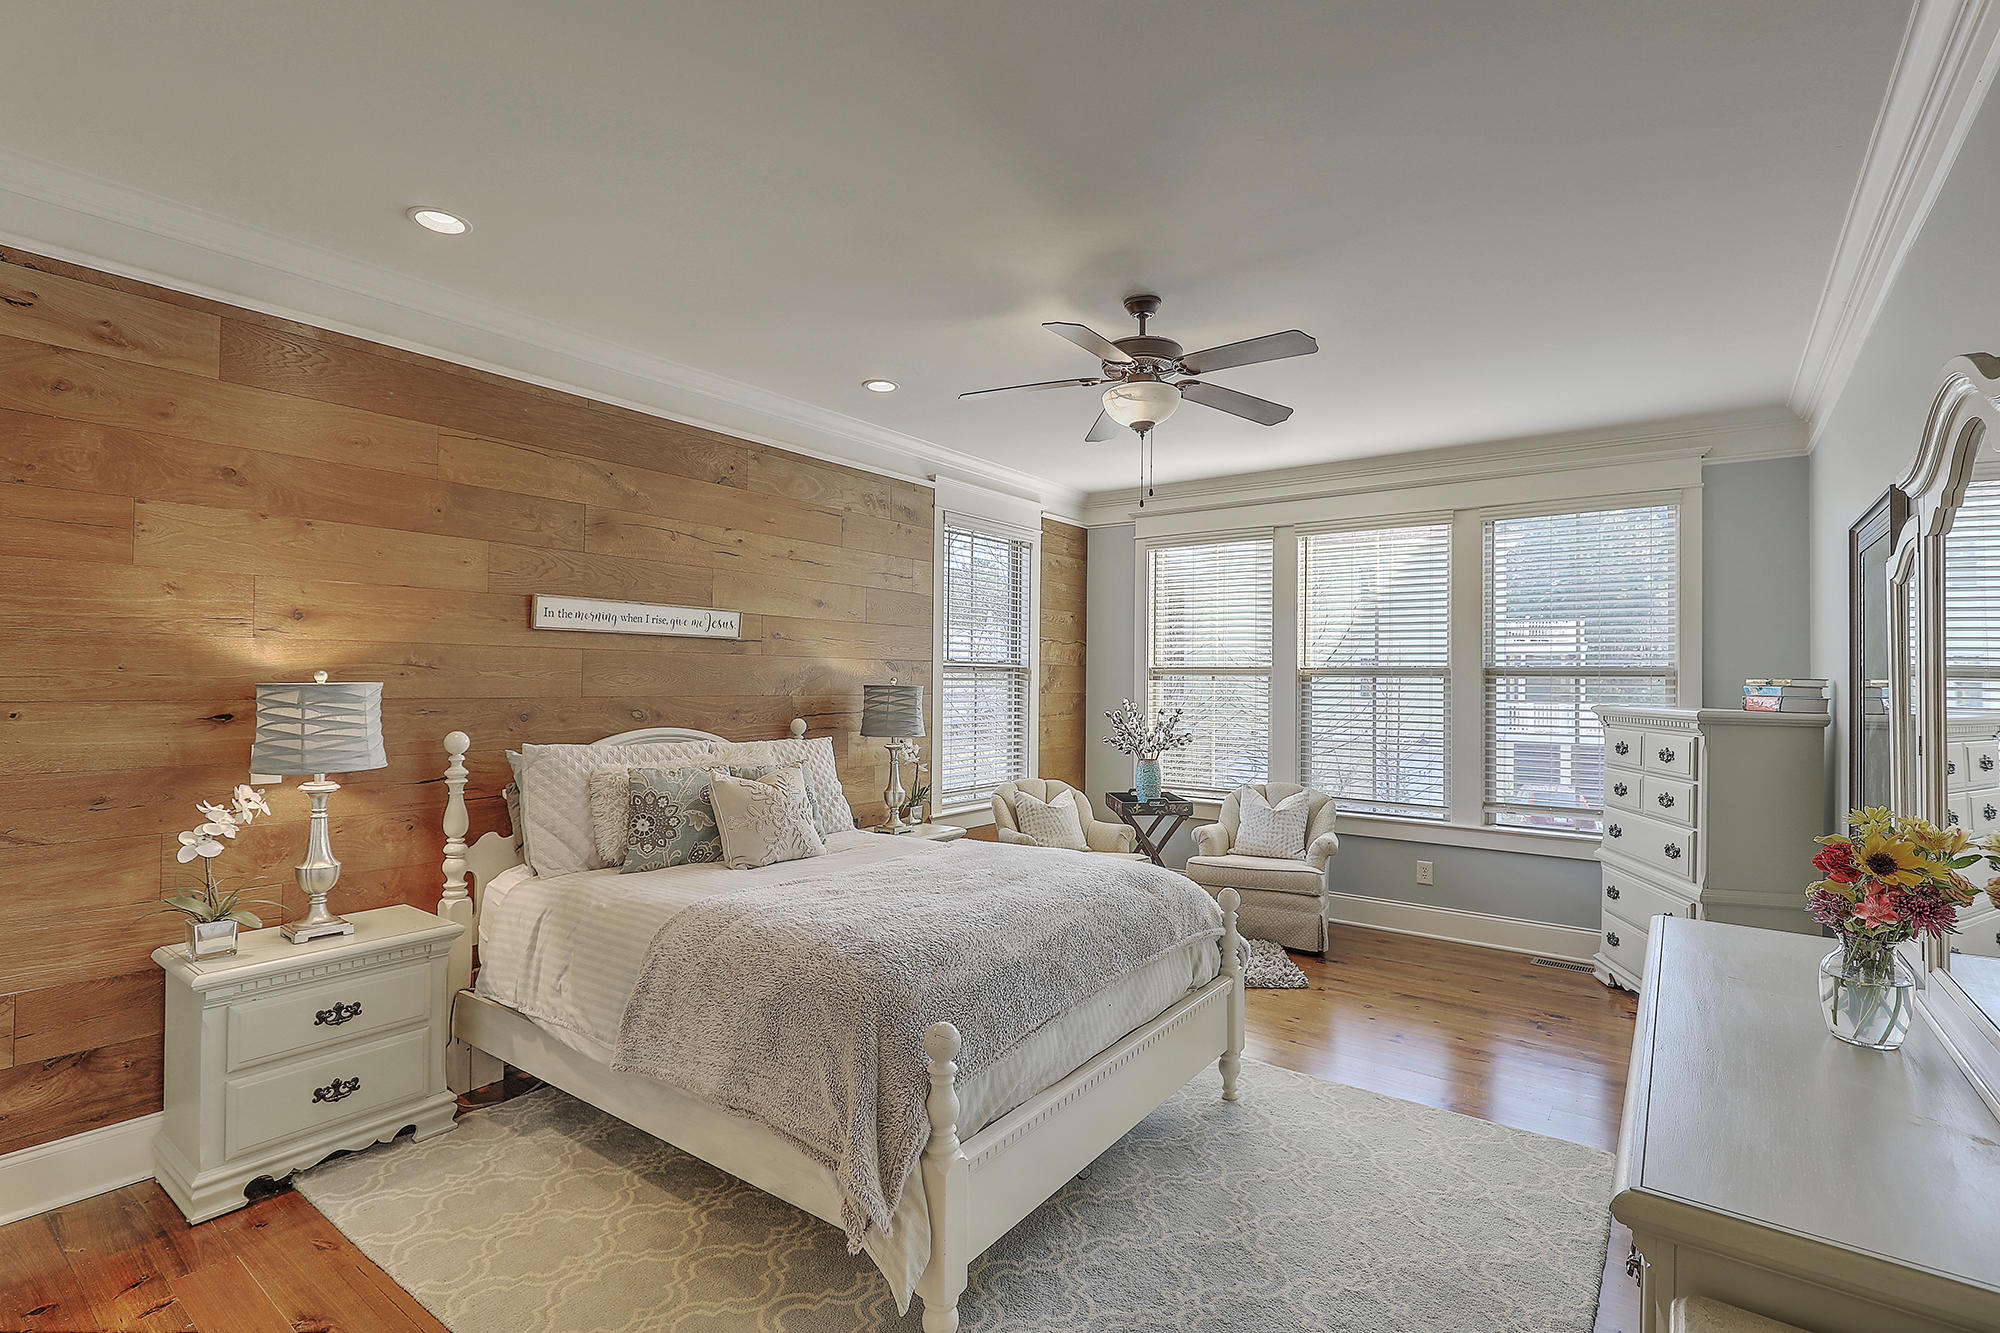 Beresford Creek Landing Homes For Sale - 1170 Rivershore, Charleston, SC - 58